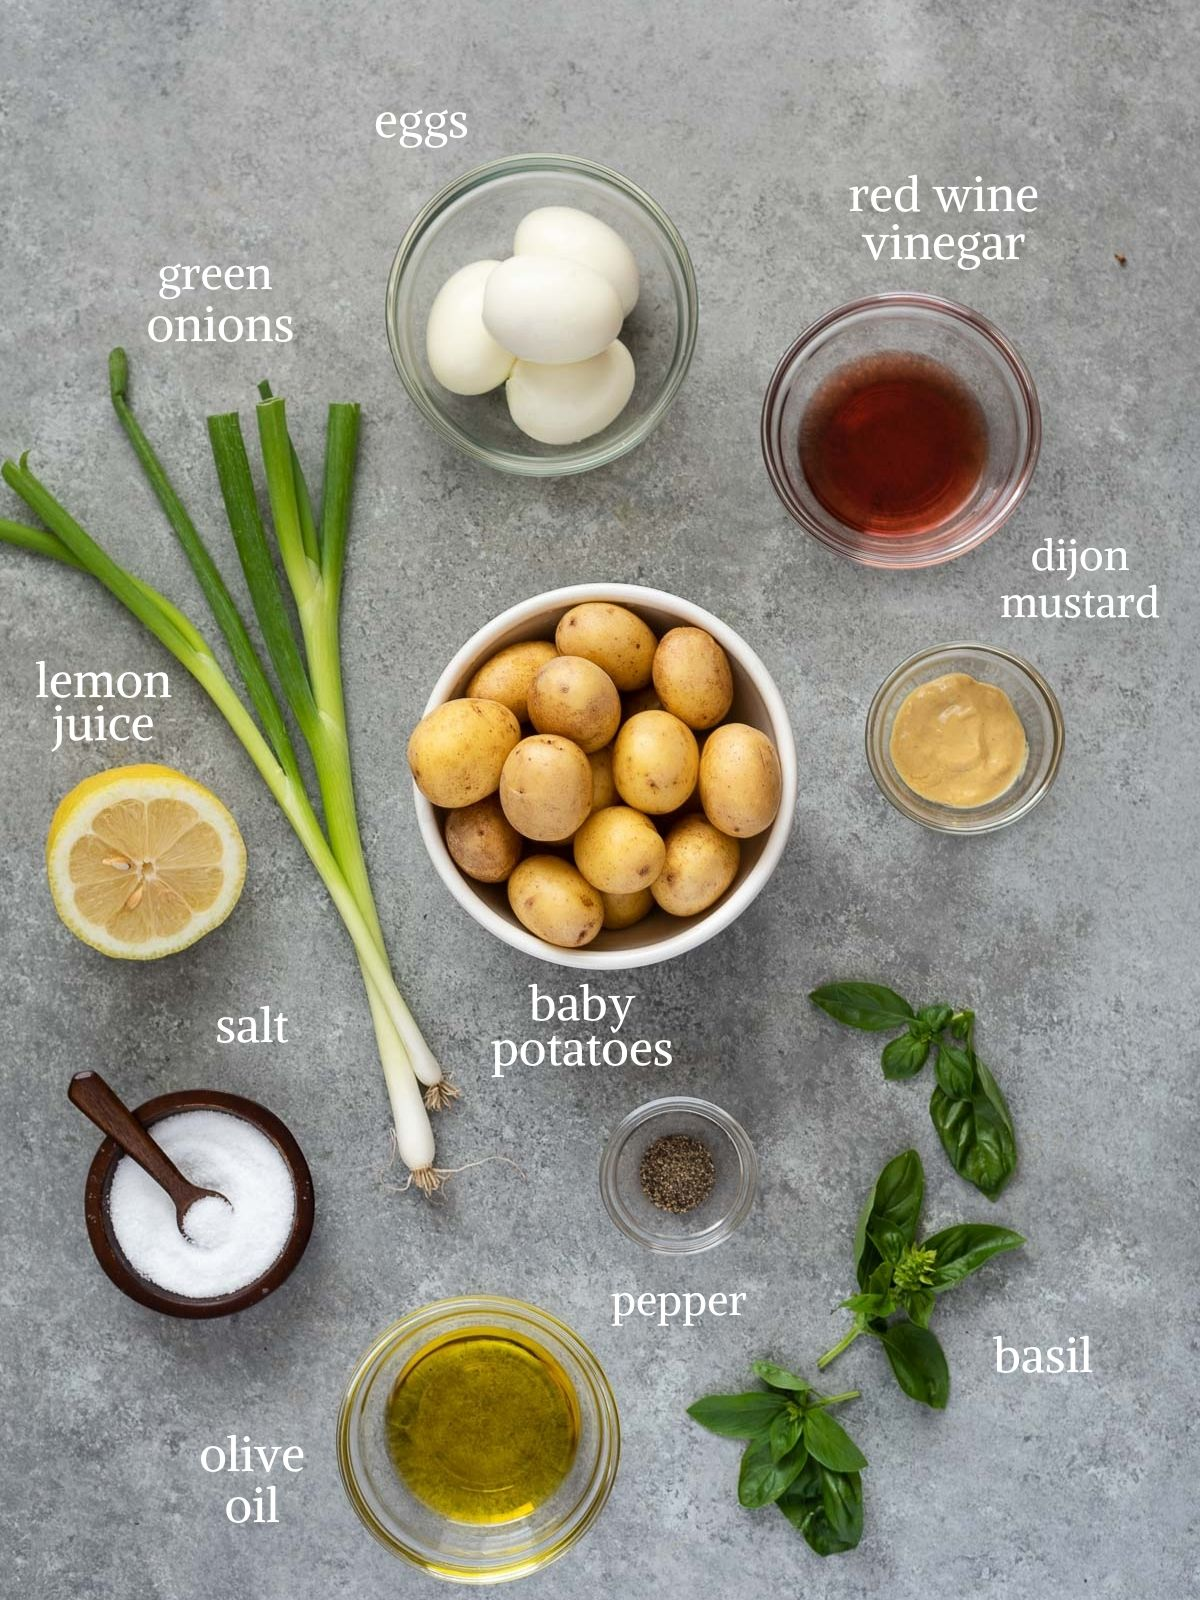 Grilled potato salad and dijon vinaigrette ingredients